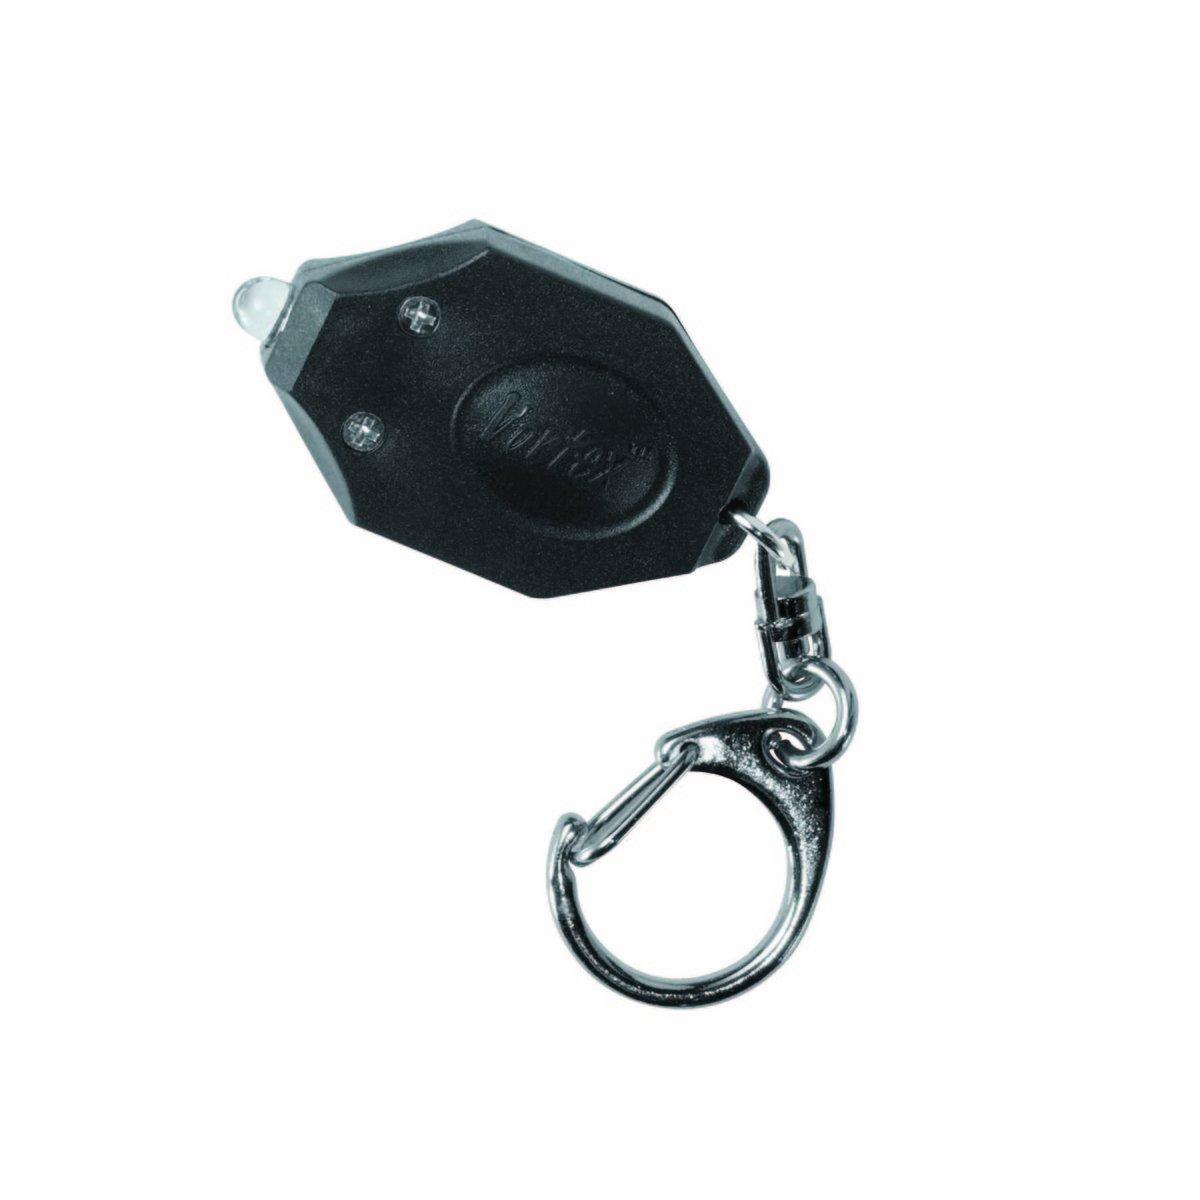 戶外LED手電筒 (PL1 黑色)